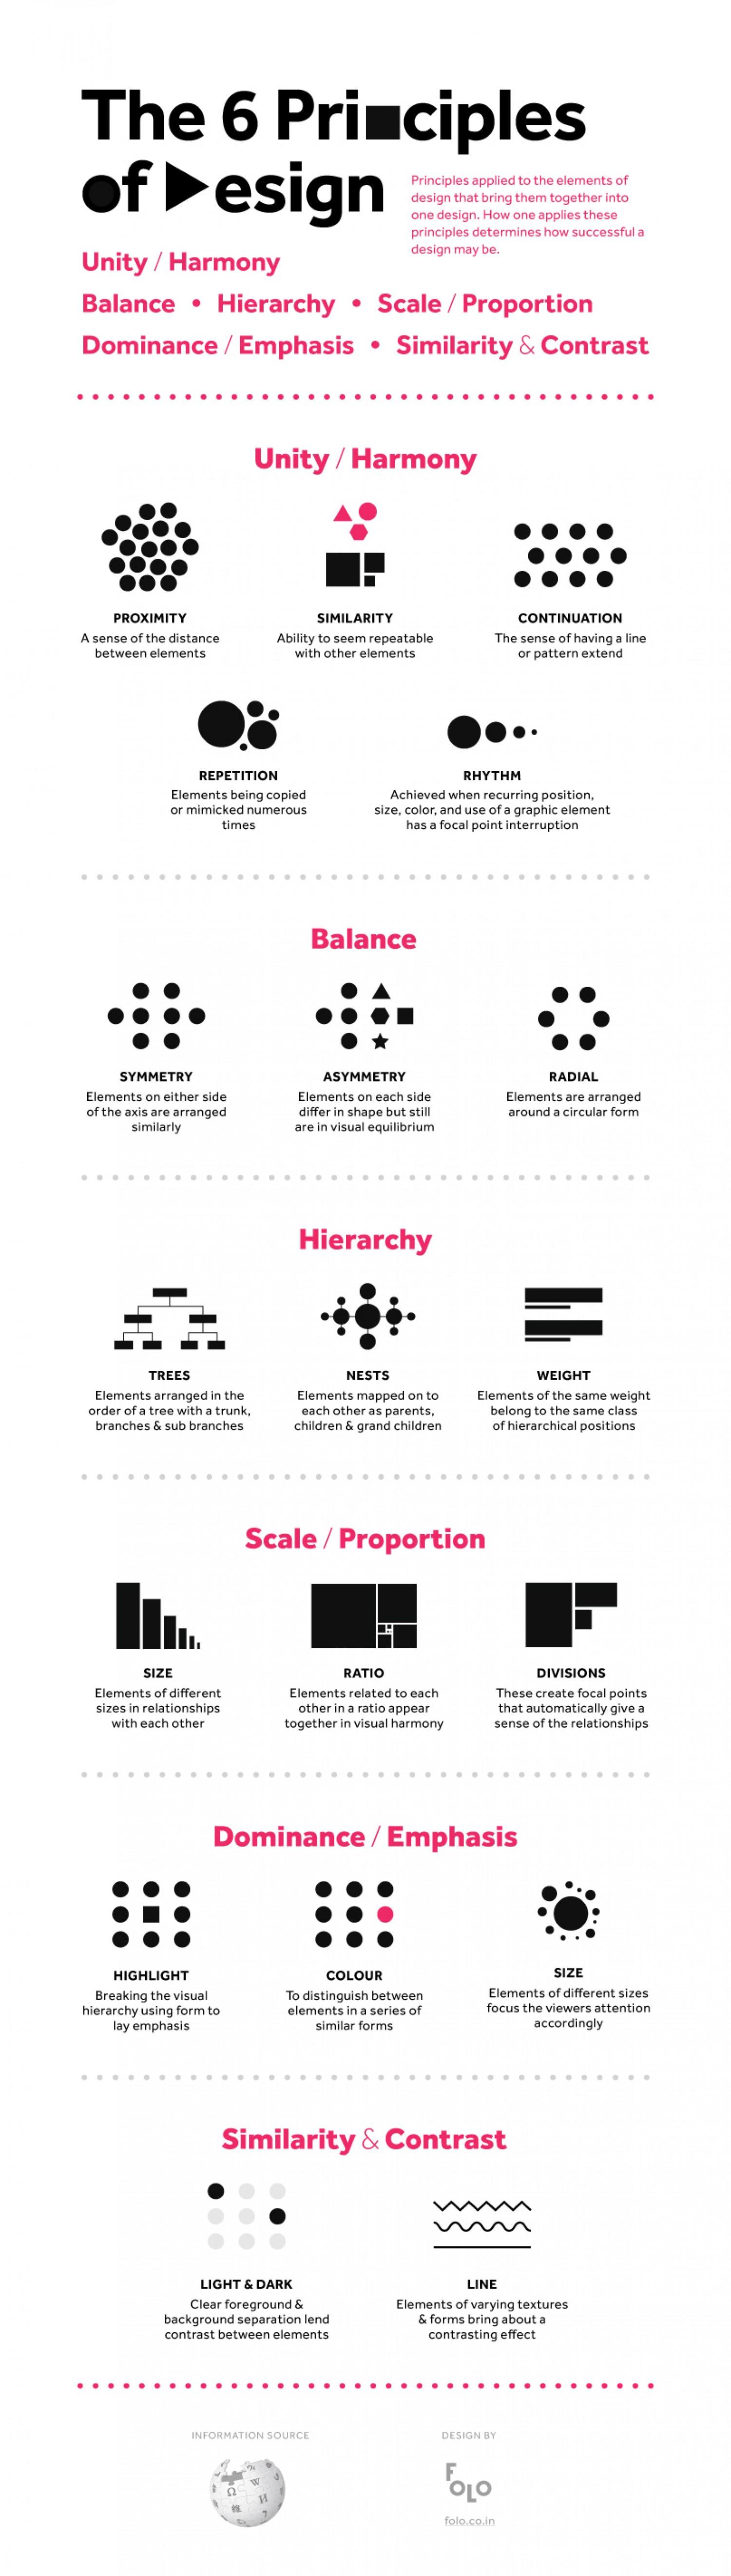 the-6-principles-of-design_5477477f48f61_w1500